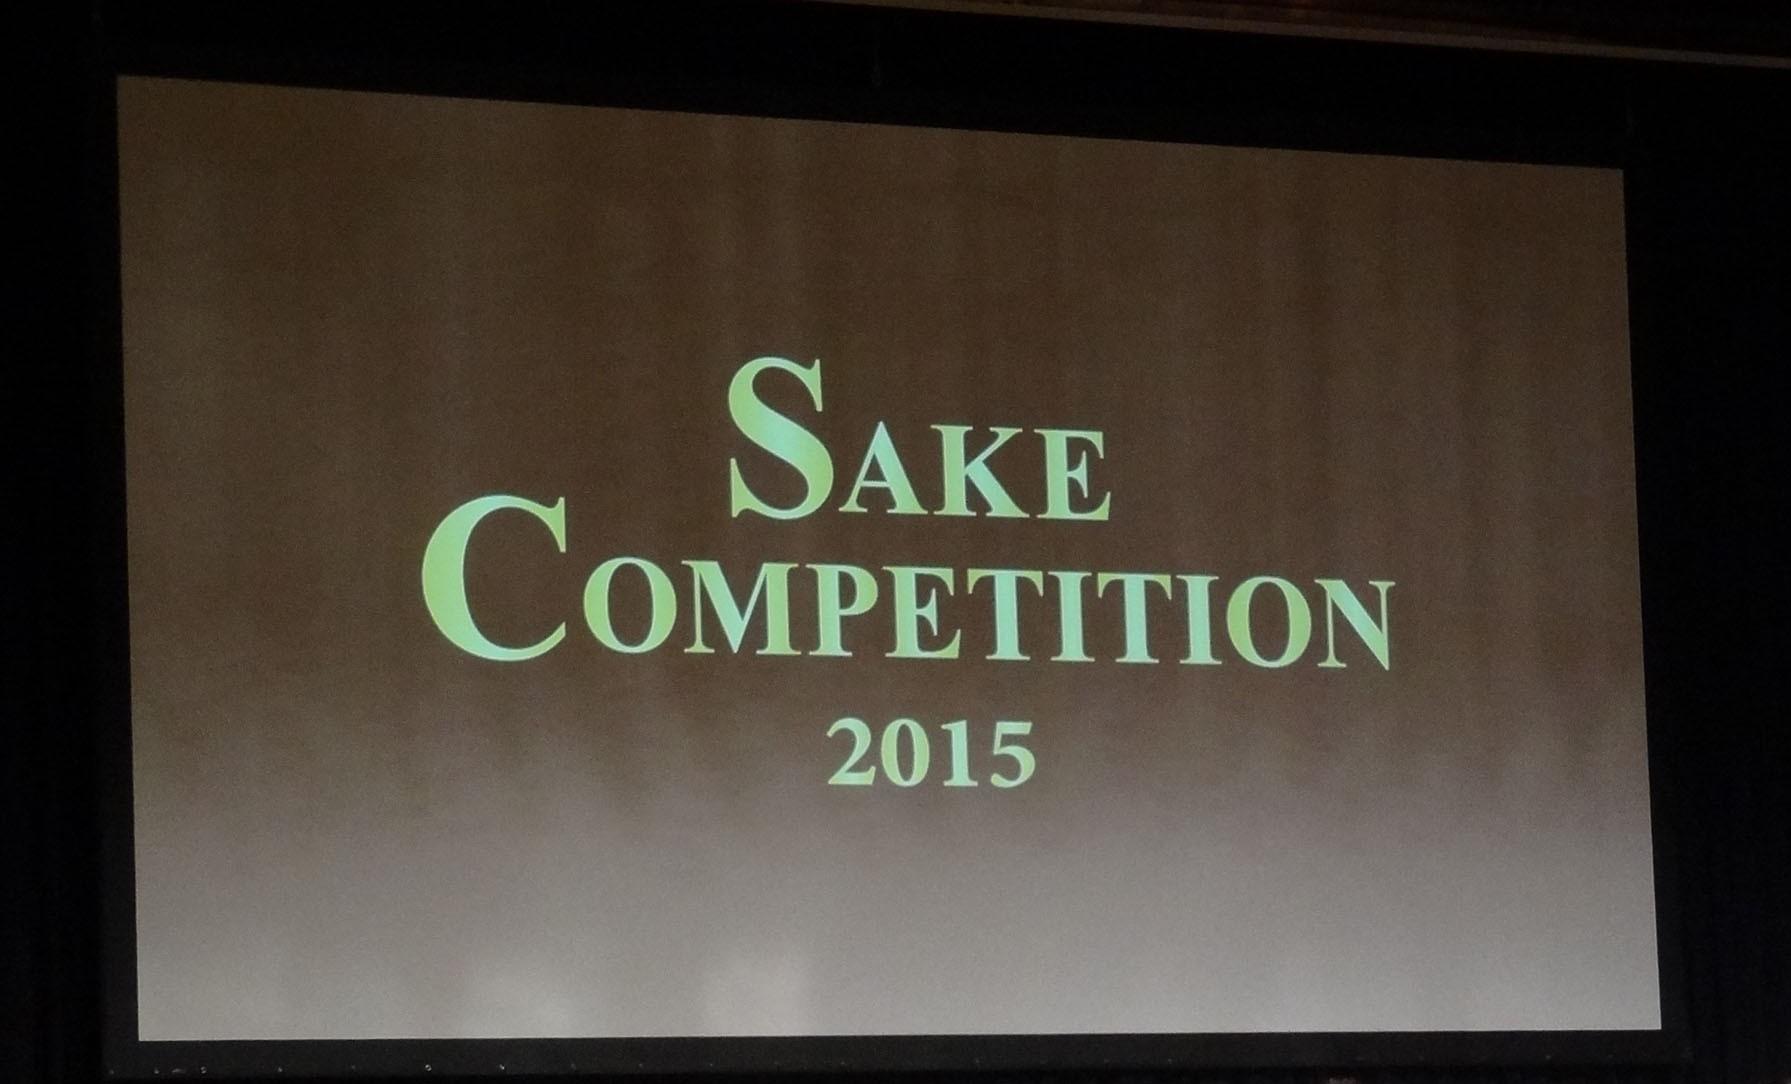 SAKE COMPETITION 2015発表、純米酒選びの指針として活用しよう